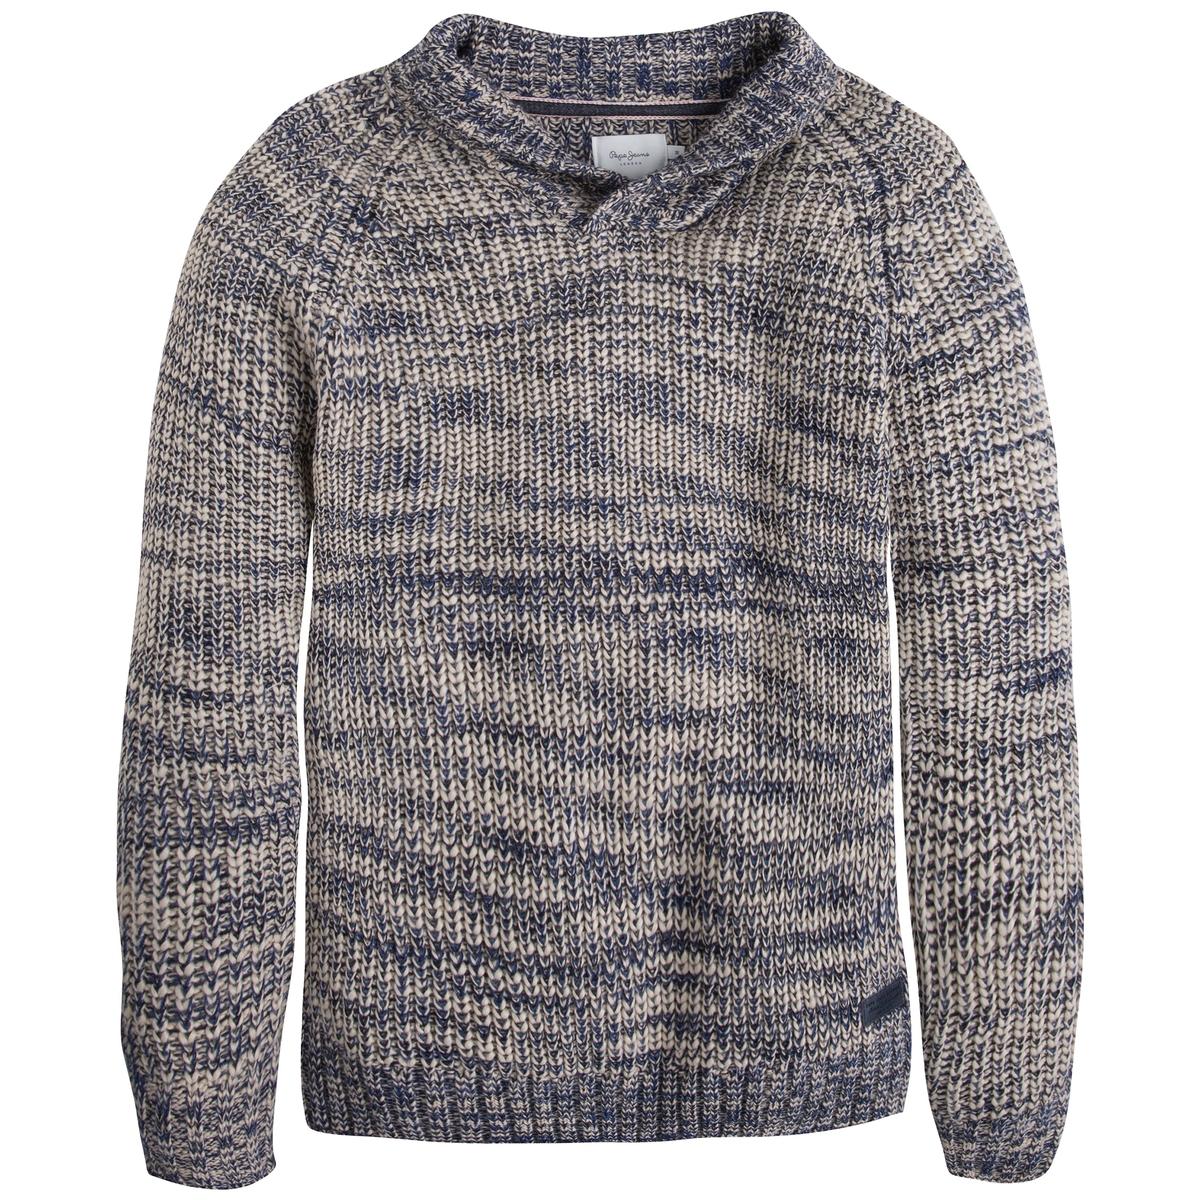 Пуловер с шалевым воротником - PEPE JEANS